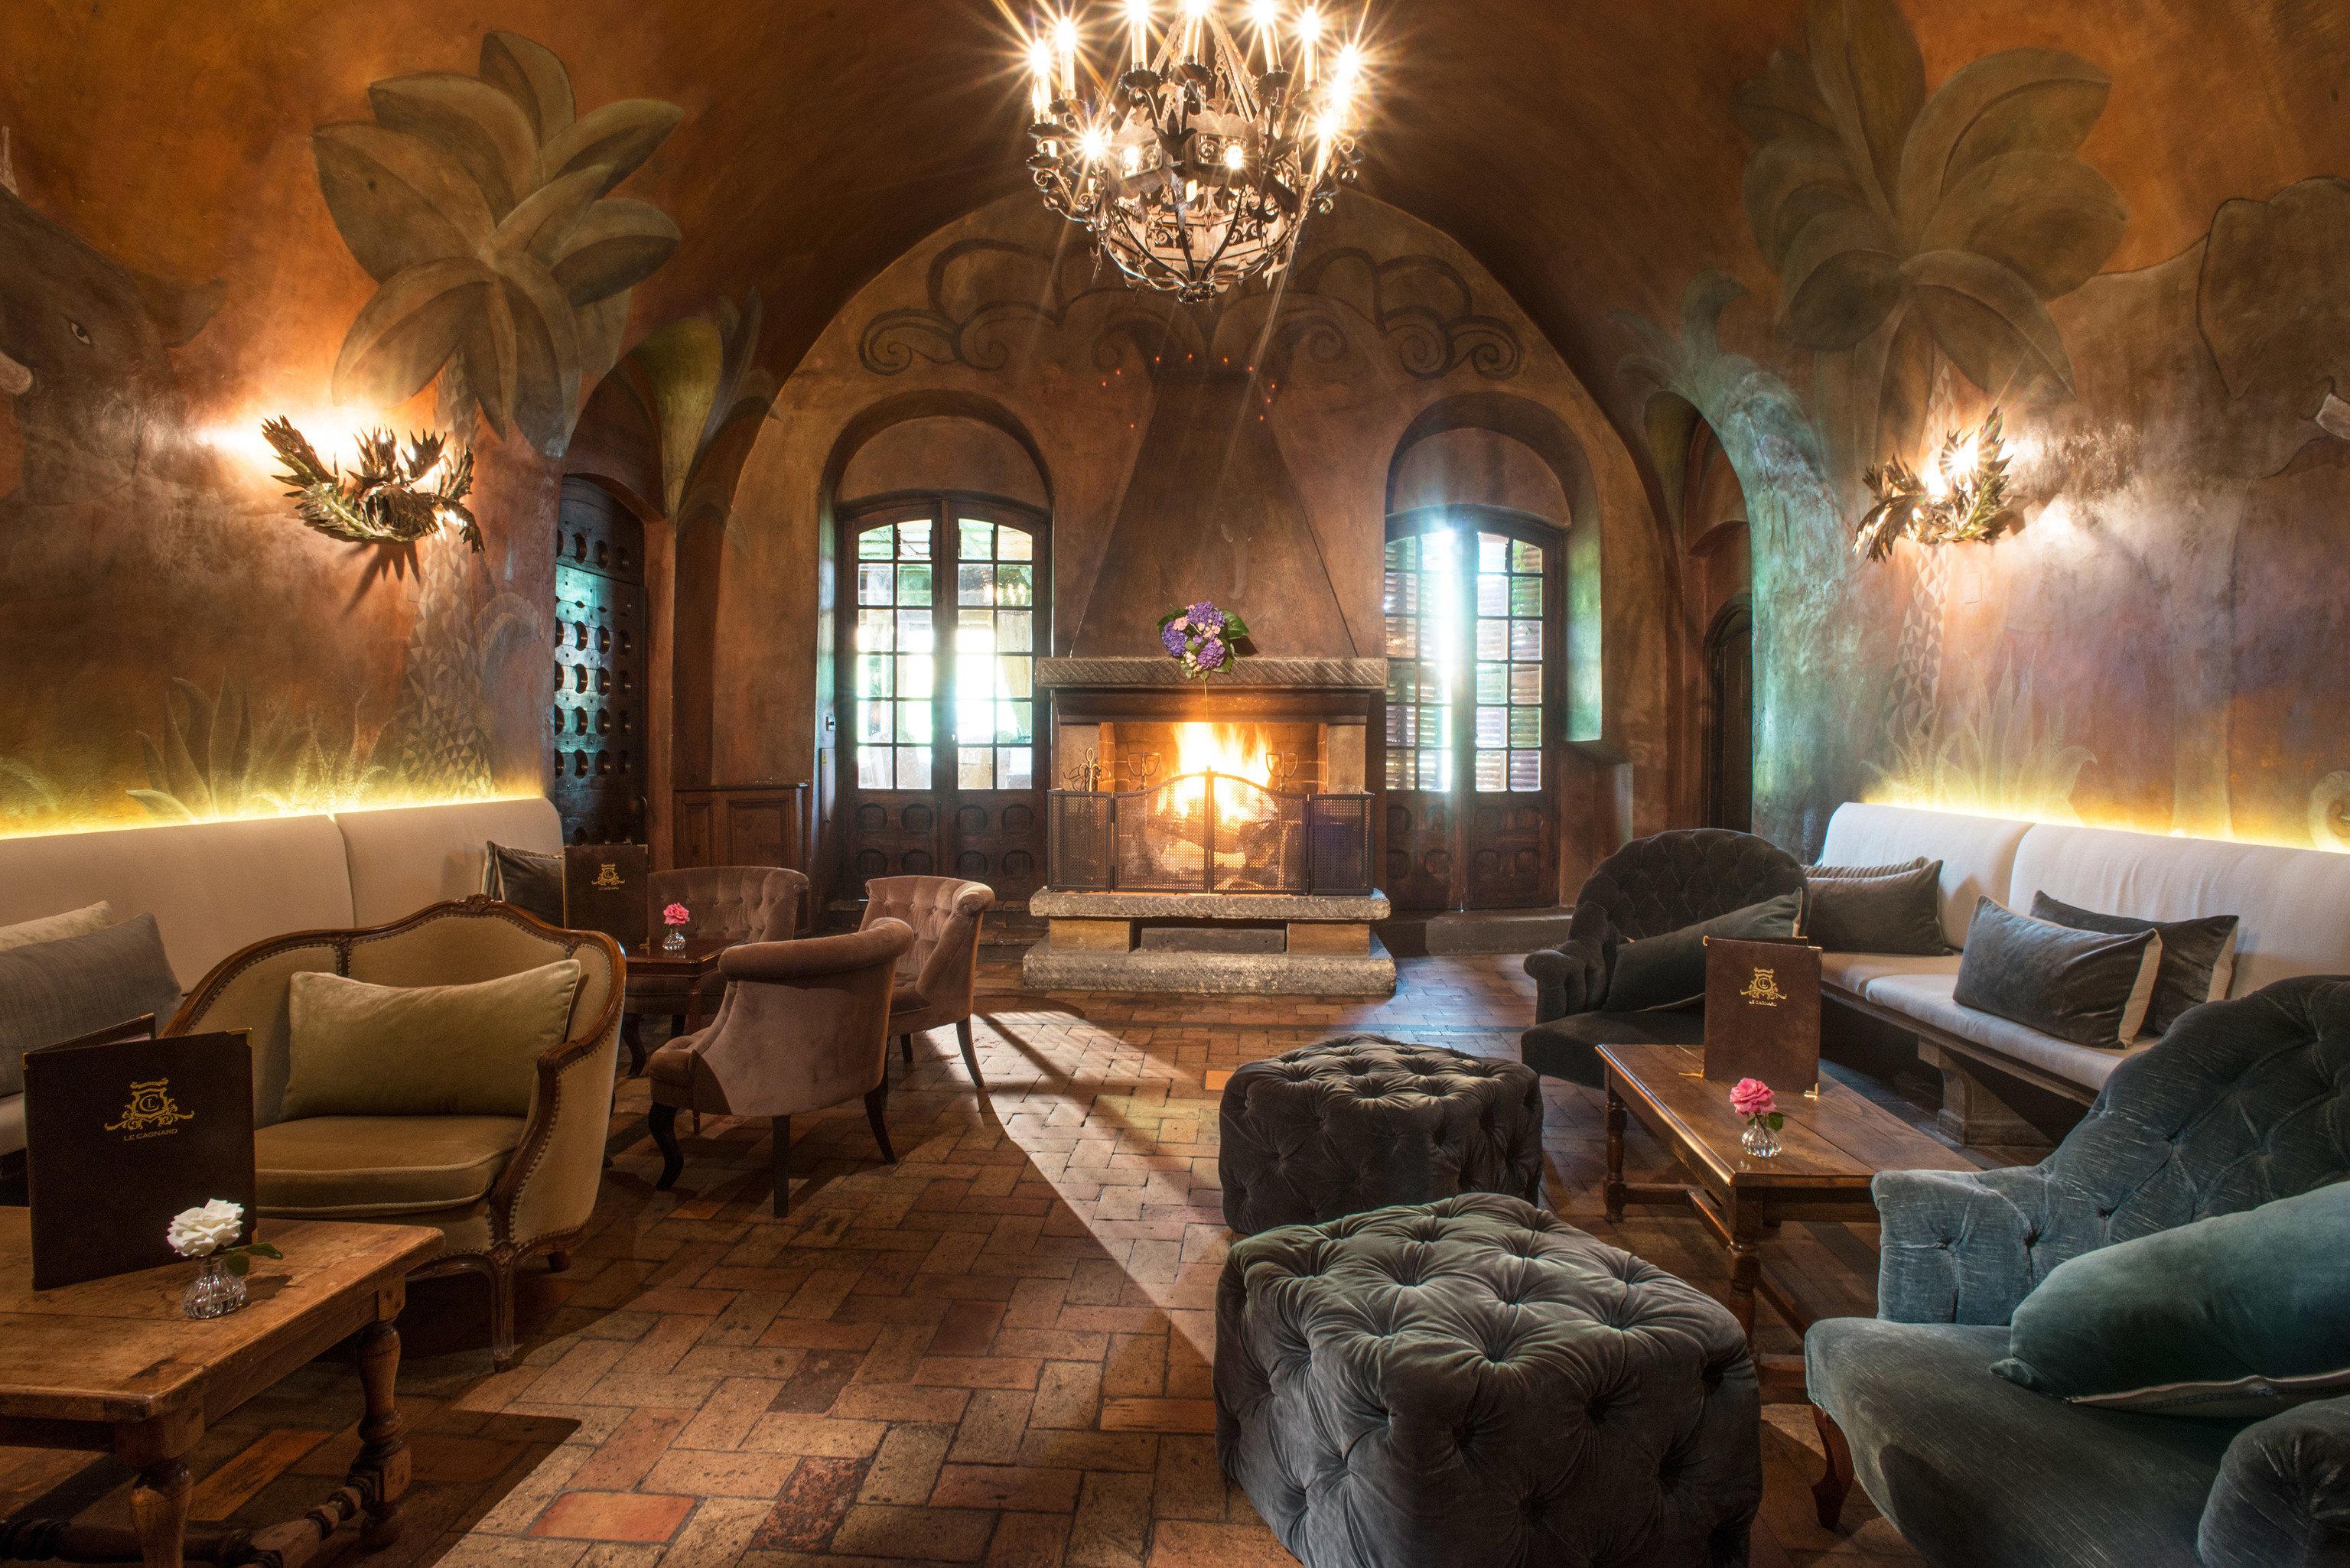 sofa property Fireplace building living room mansion Lobby home lighting screenshot hacienda stone